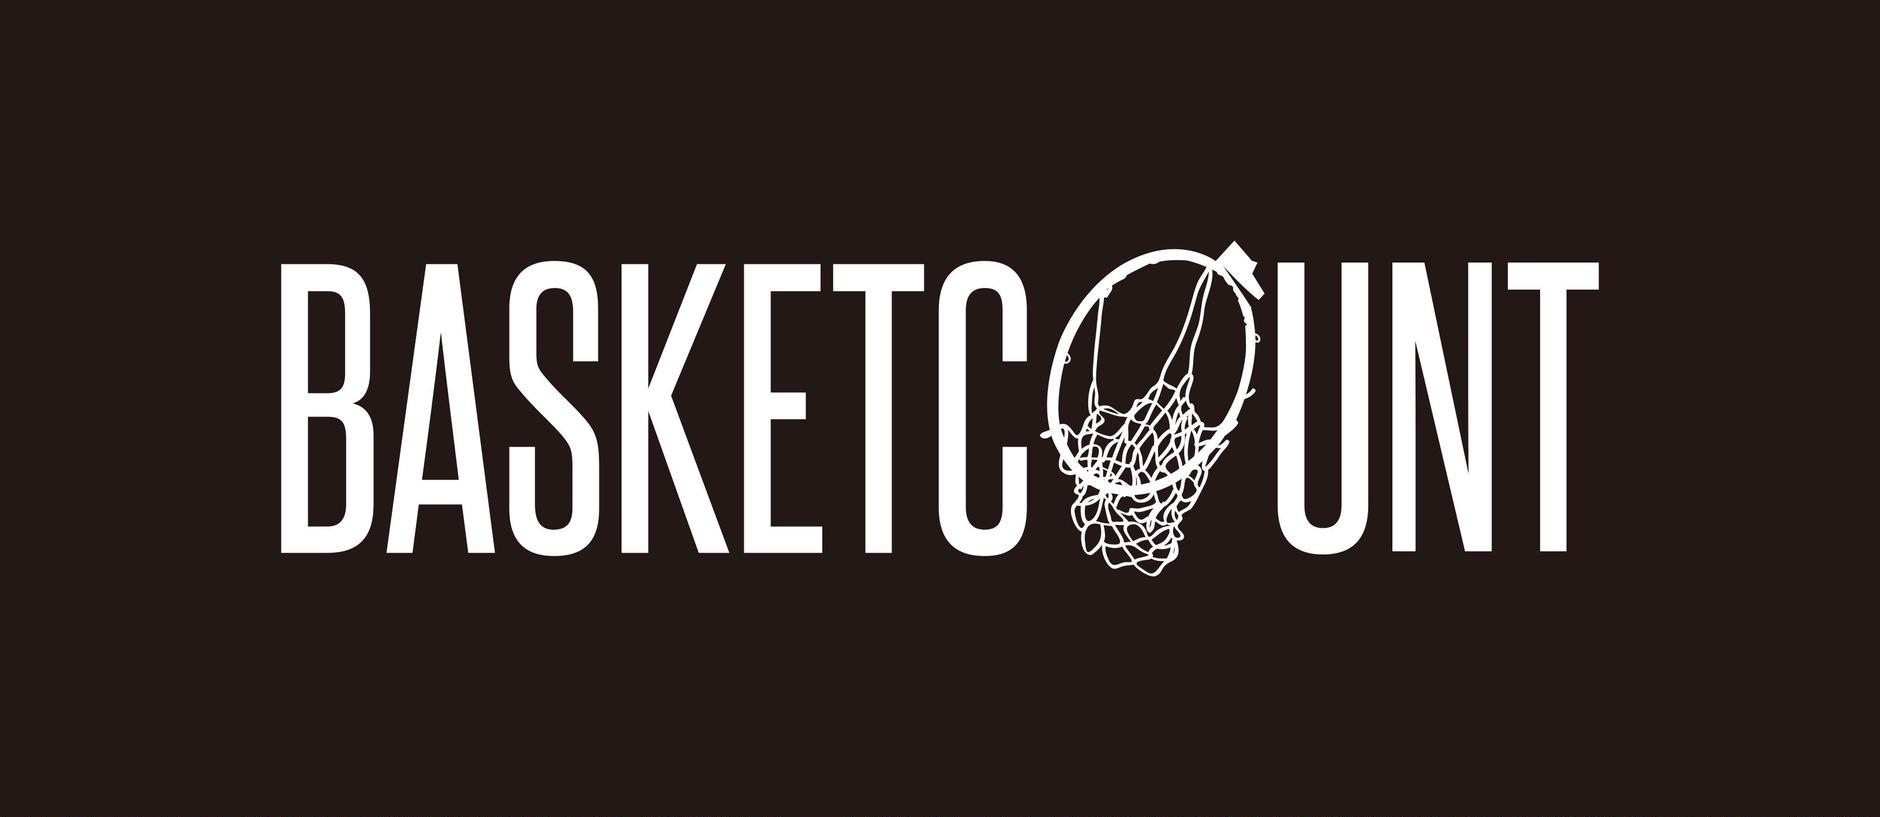 BASKETCOUNT(バスケットカウント)公式オンラインストア